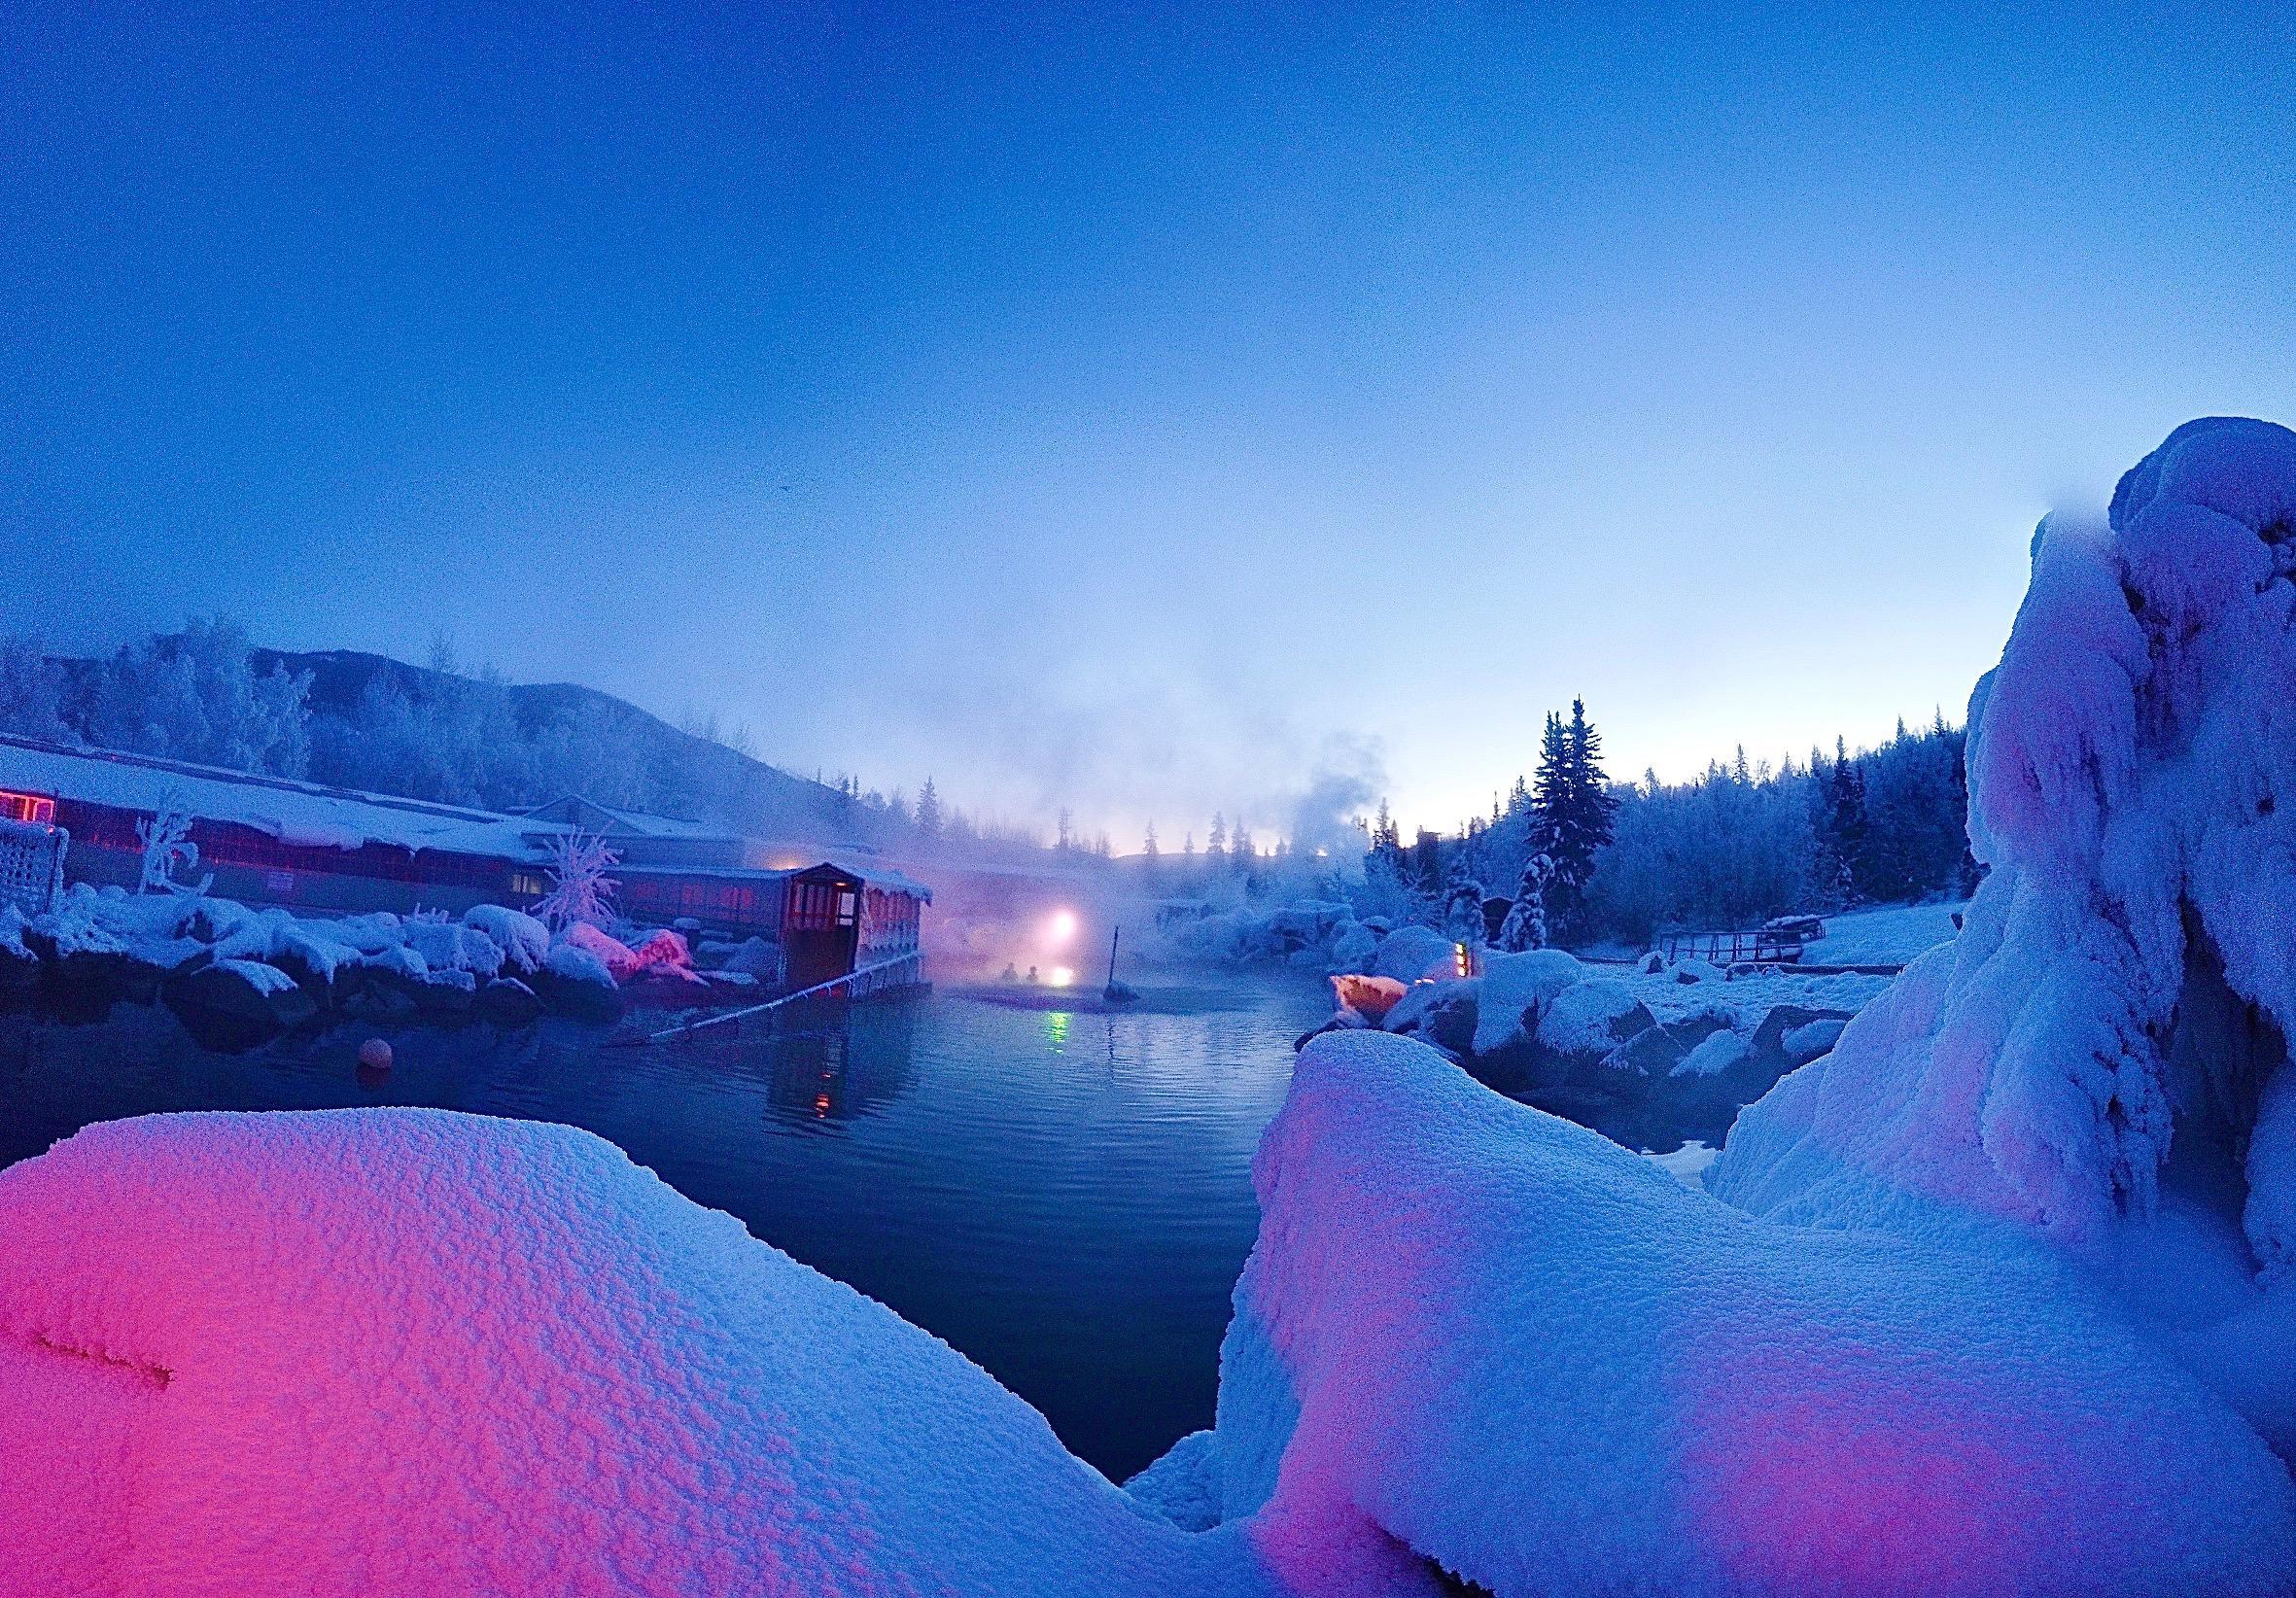 Hot Springs Aurora Viewing Dream